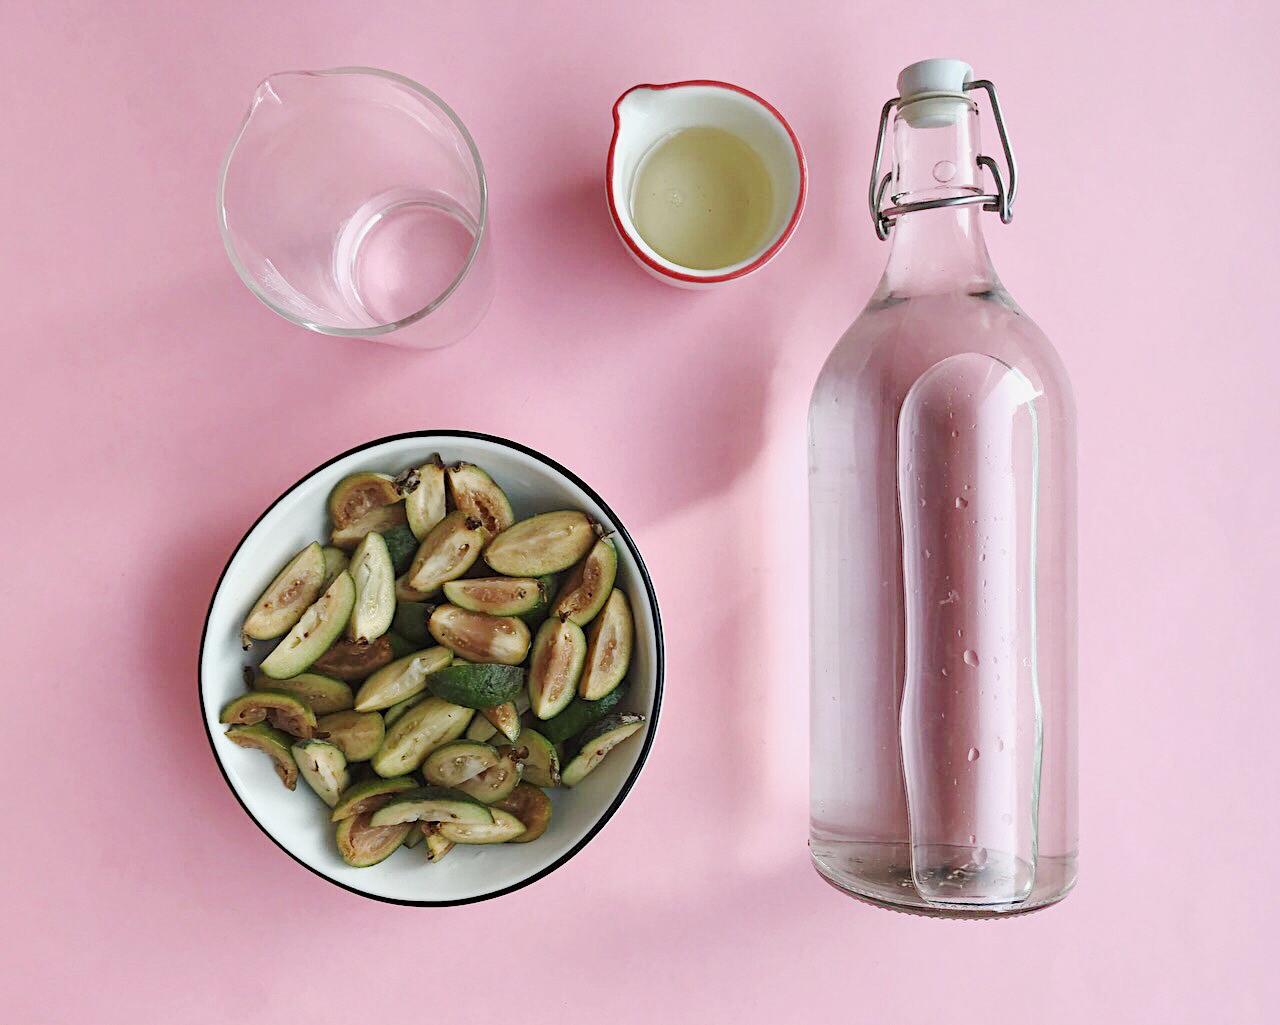 Рецепты домашней настойки на фейхоа на водке ⛳️ алко профи